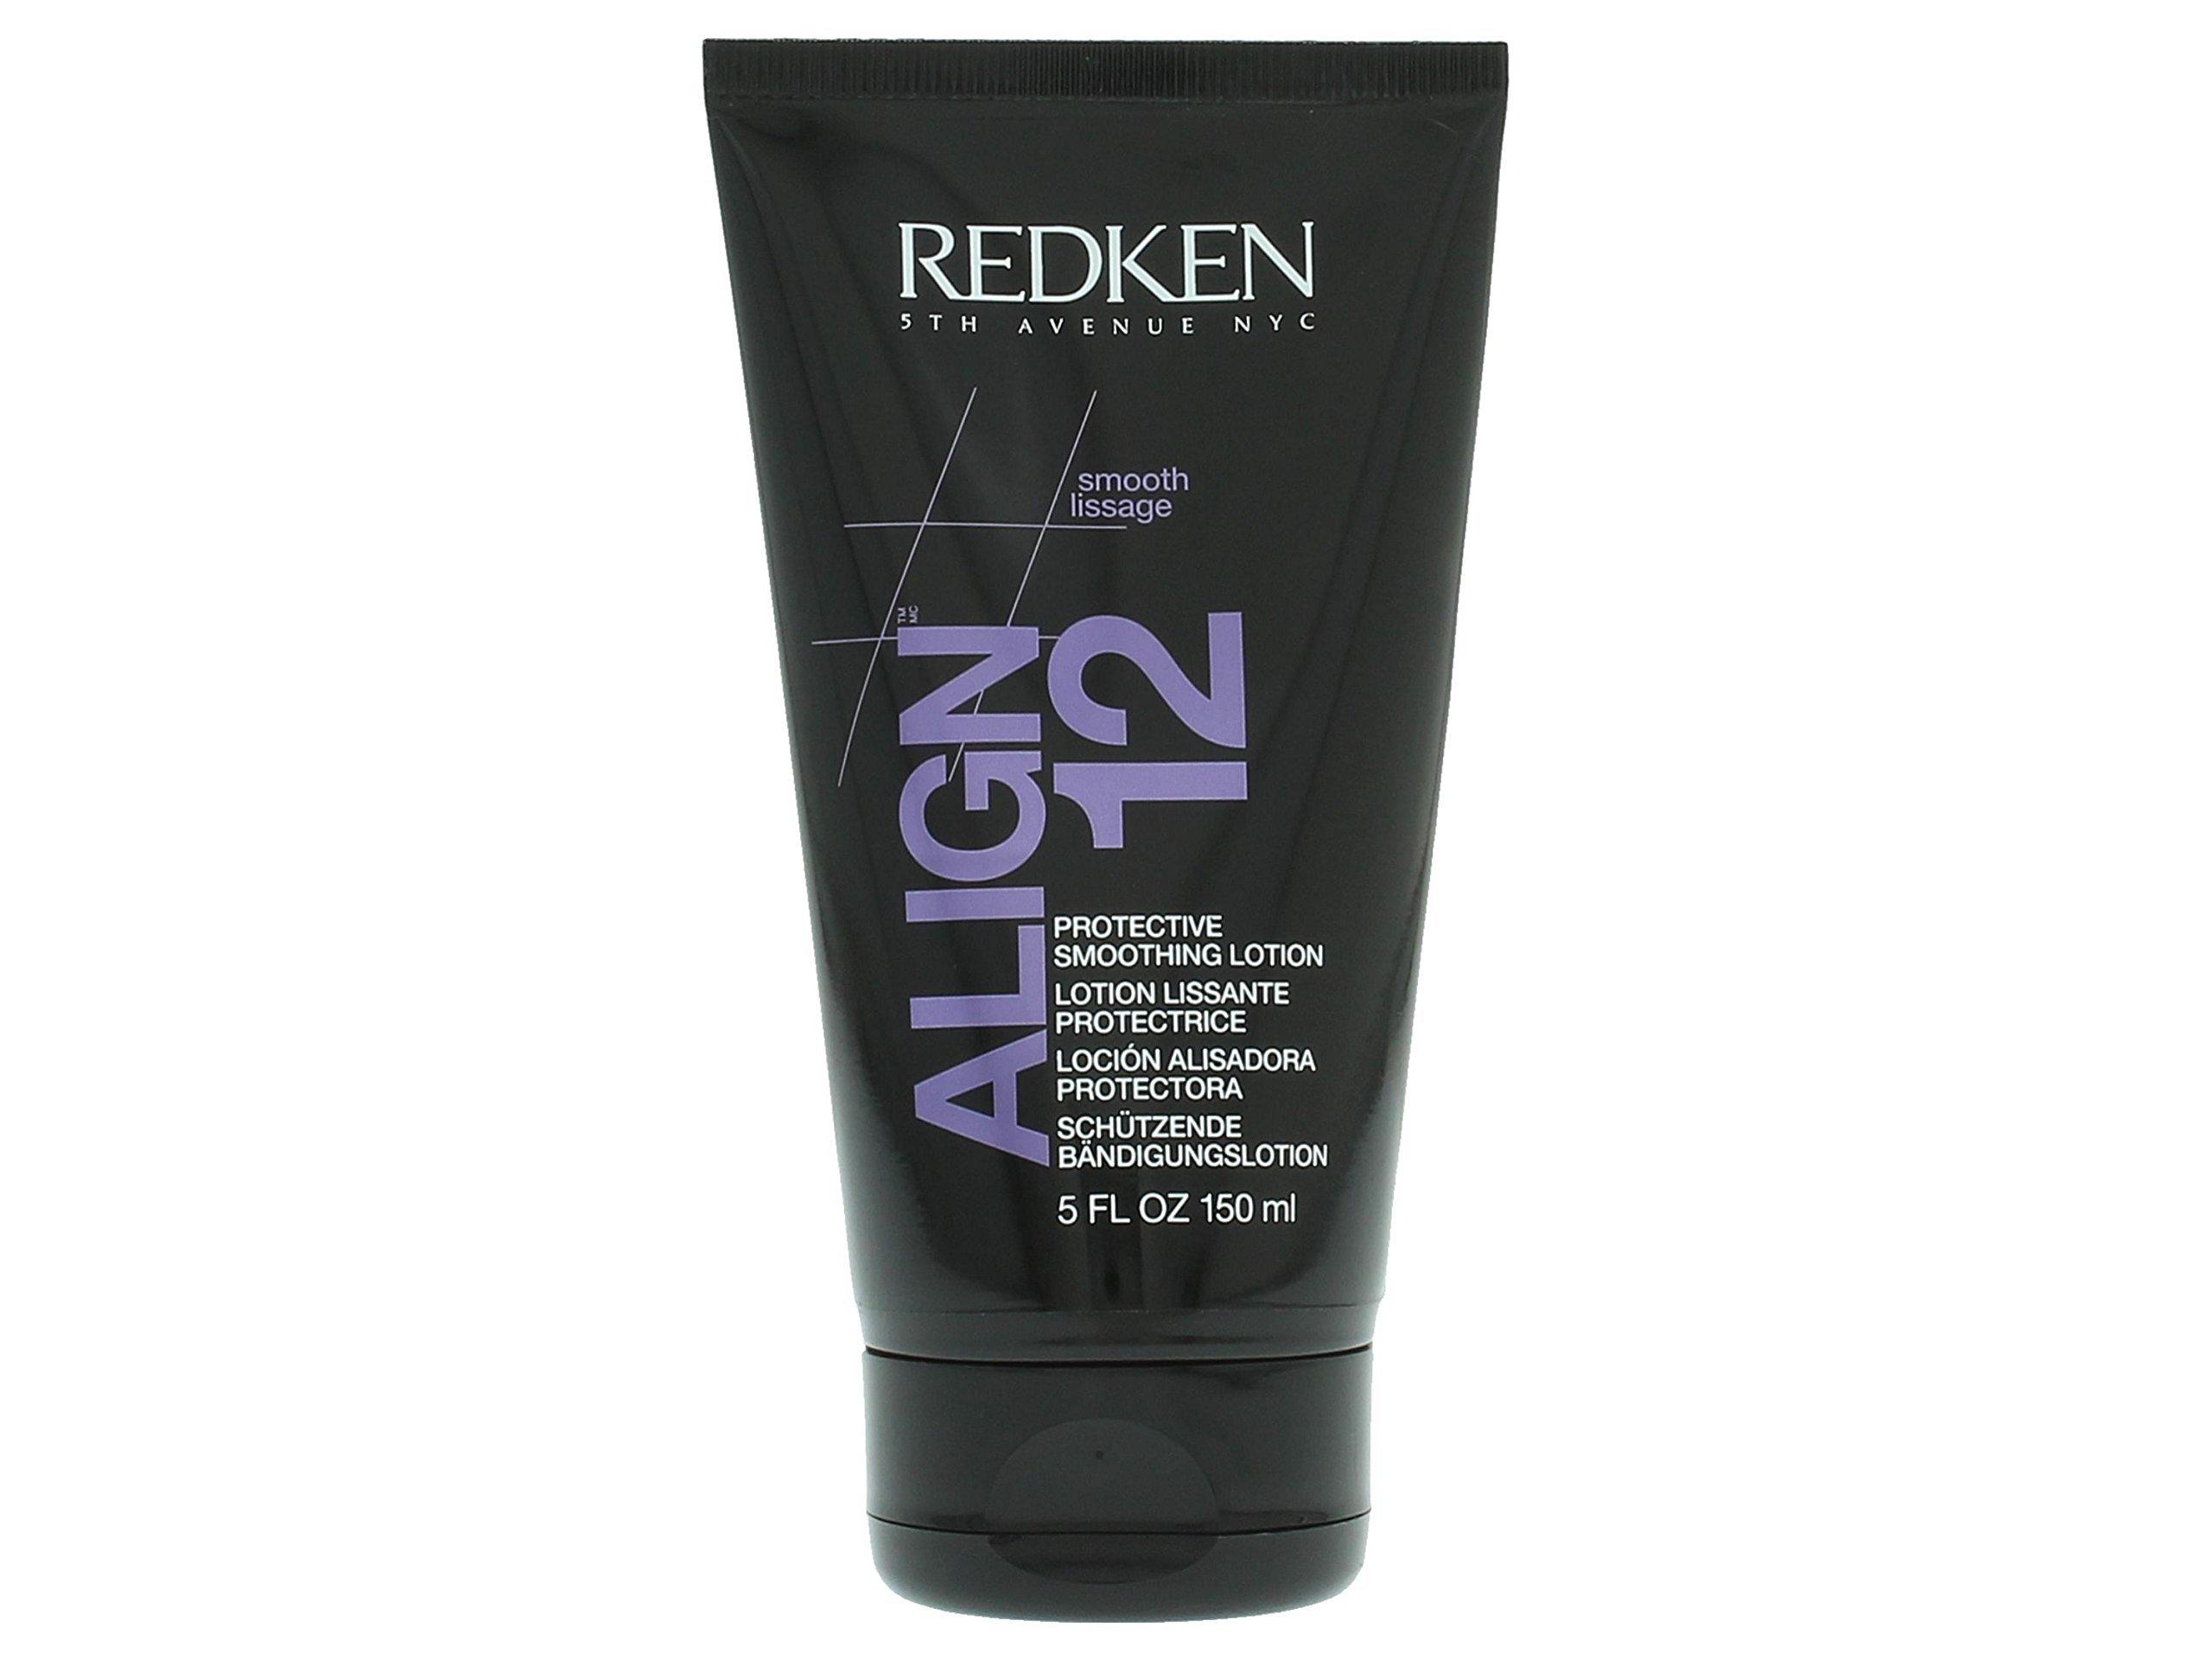 Pokupki customer account login/downloader - Redken Align 12 Protective Smoothing Lotion 5 Oz